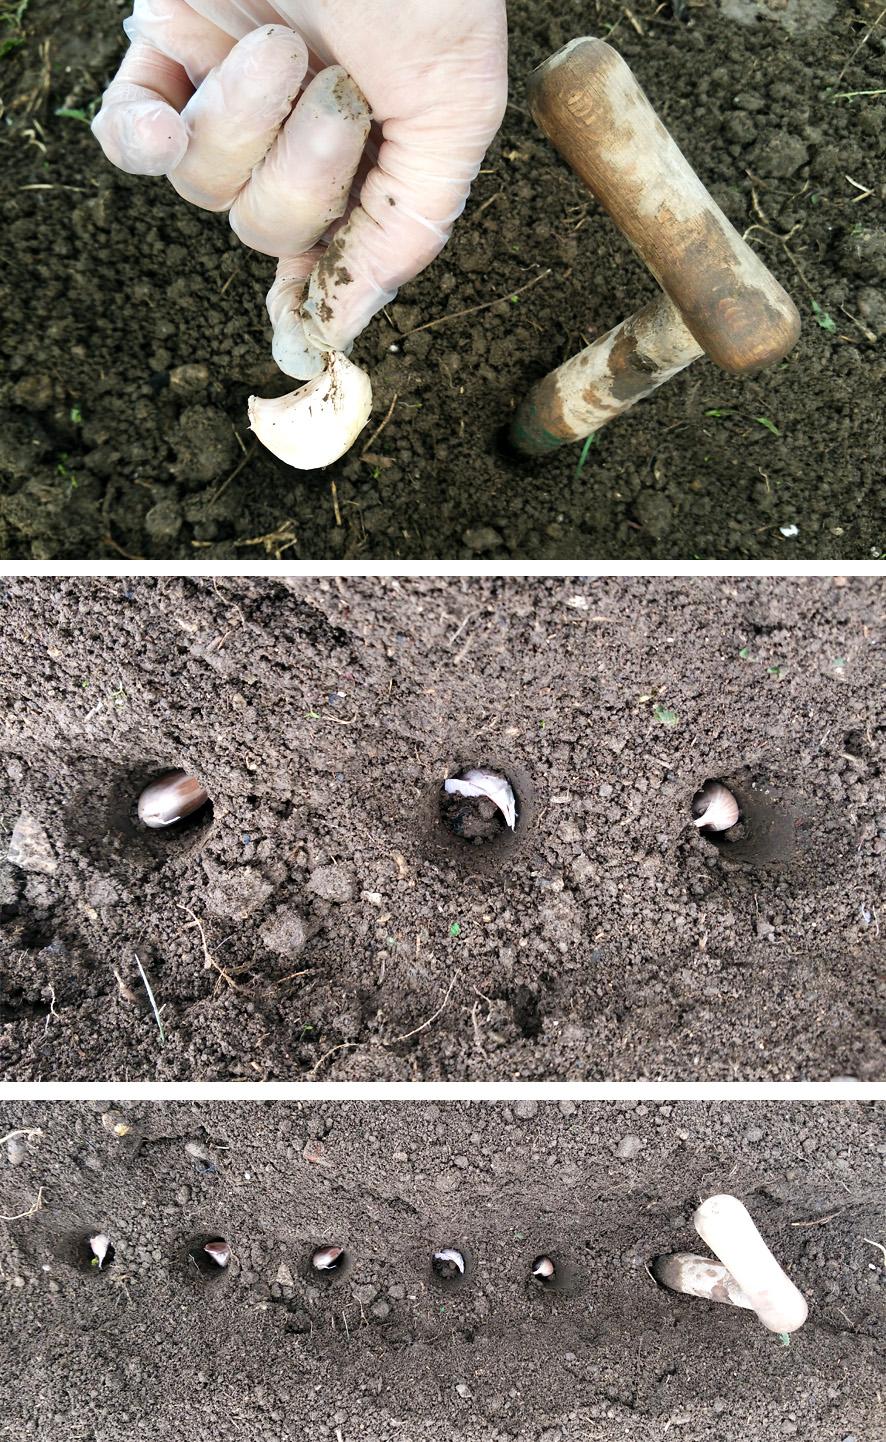 Como sembrar ajos